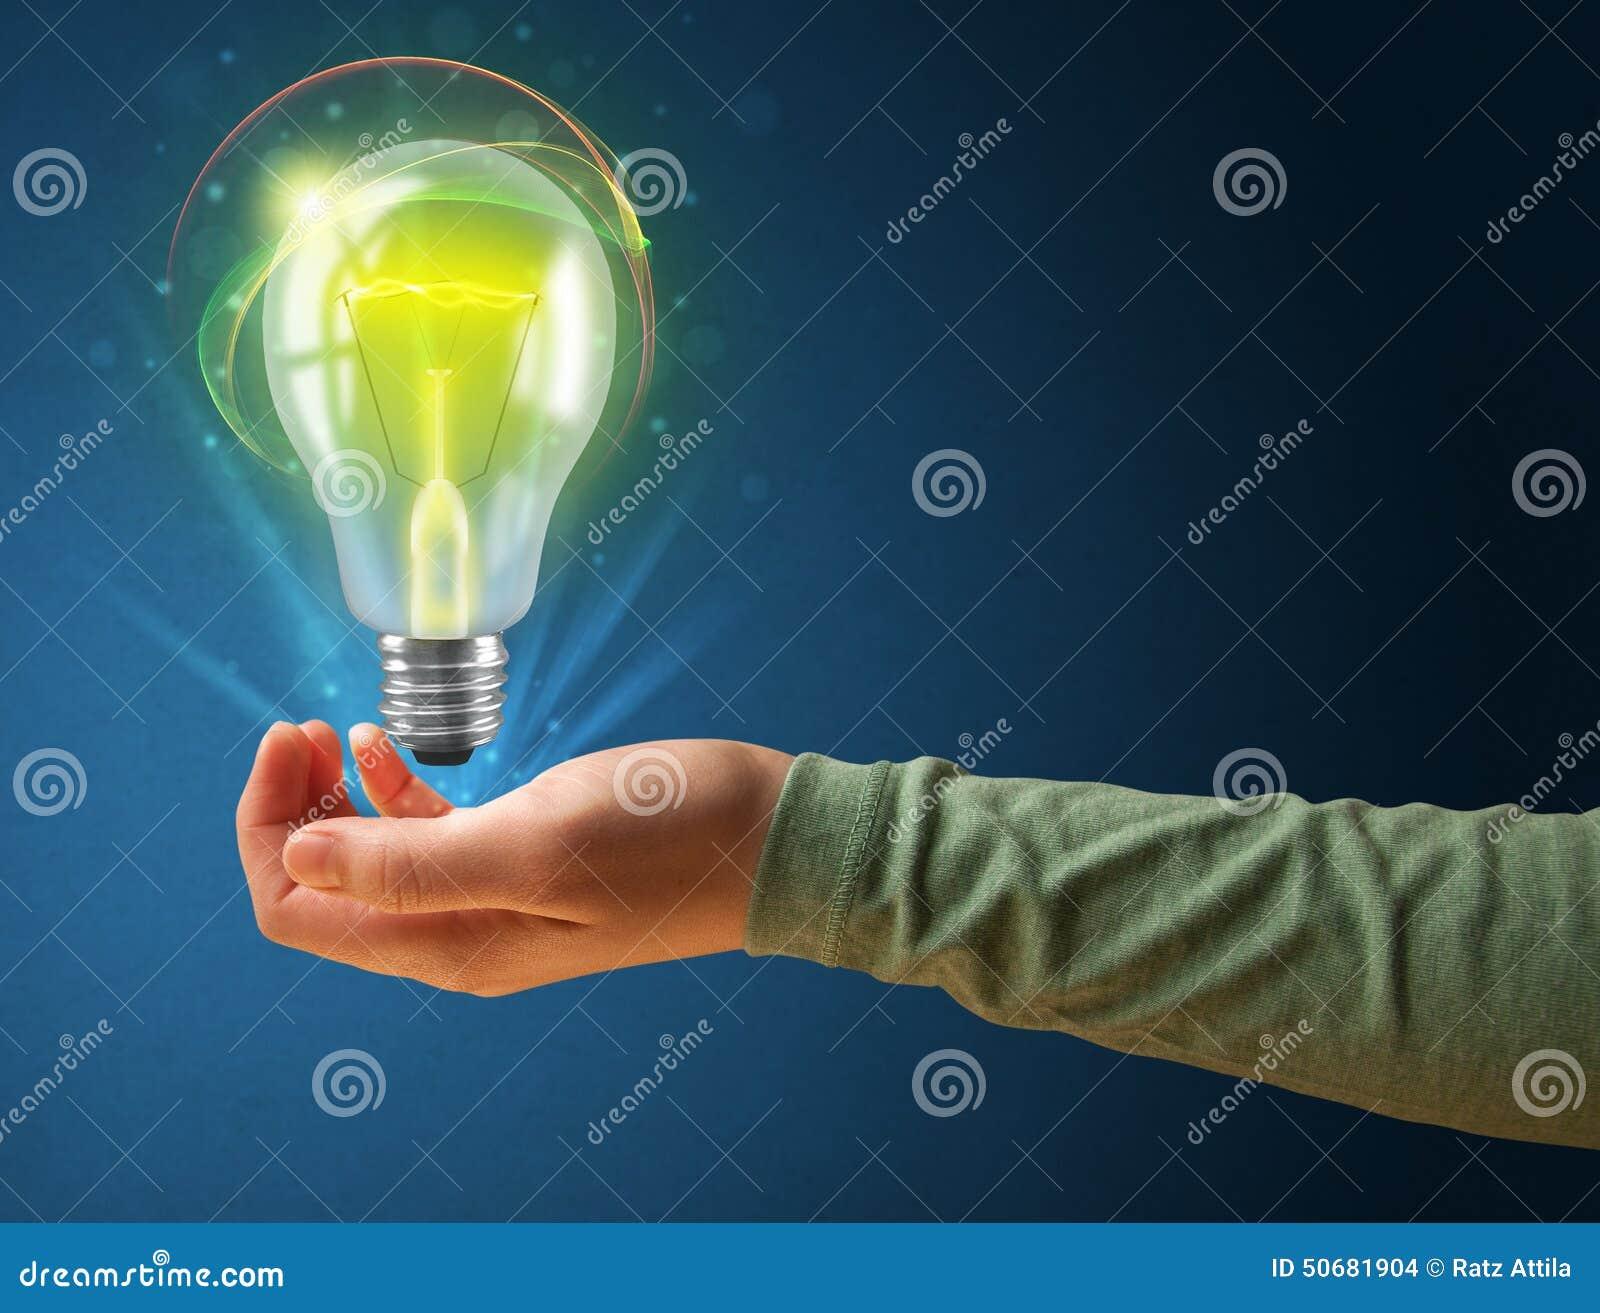 Download 发光的电灯泡在妇女的手上 库存例证. 插画 包括有 偶然, 玻璃, 背包, 女性, 现有量, 藏品, 暂挂 - 50681904